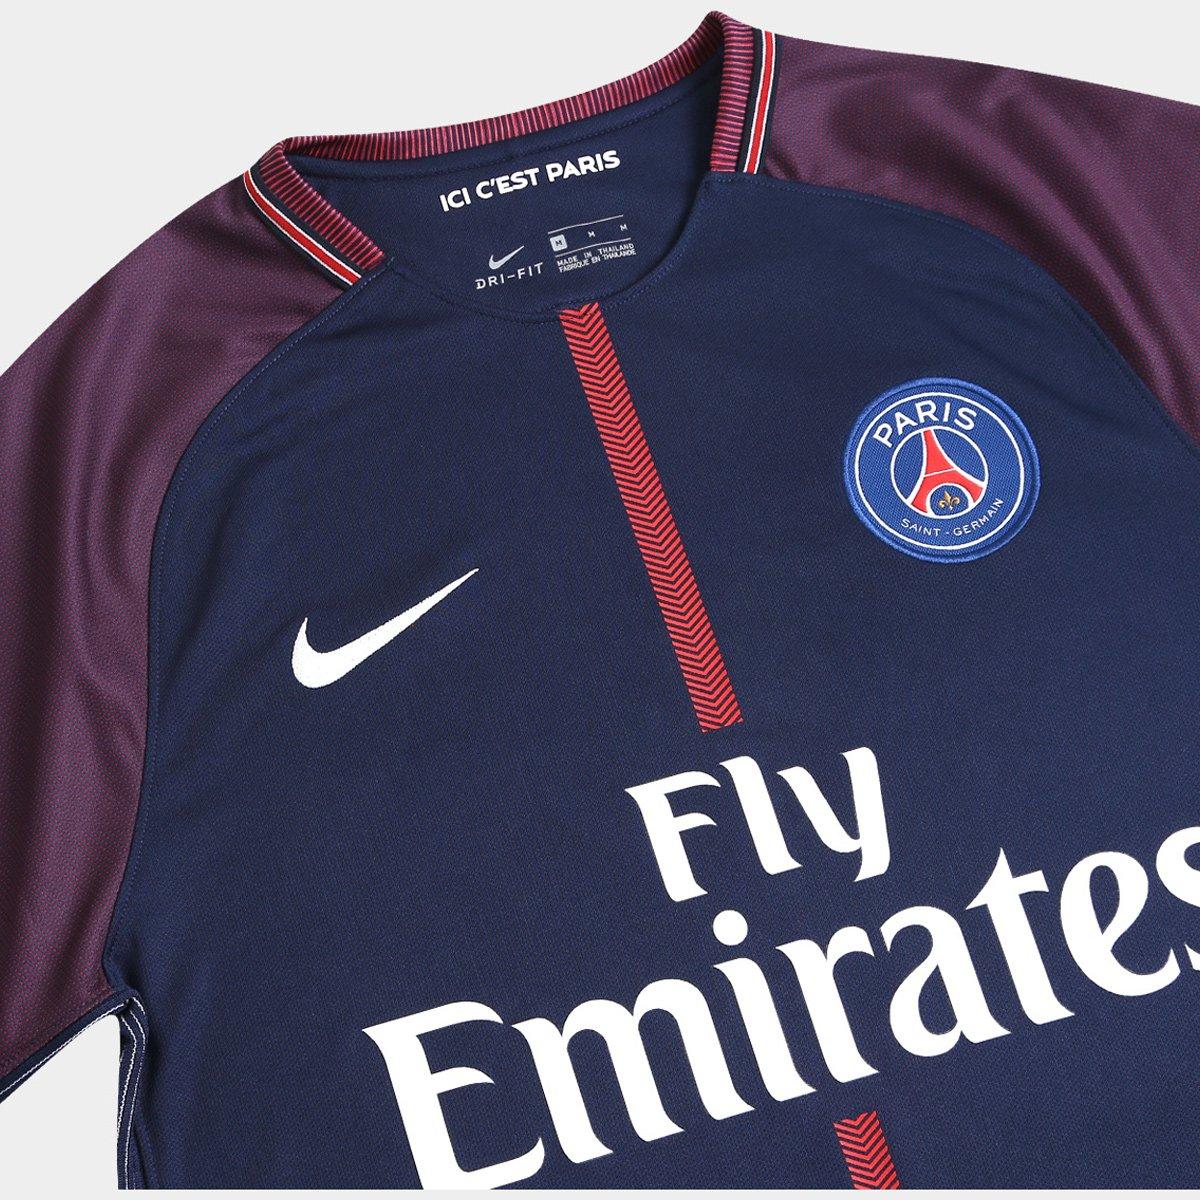 ... Camisa Paris Saint Germain Home 17 18 n° 10 Neymar Jr Torcedor Nike  Masculina 991aacfca2100